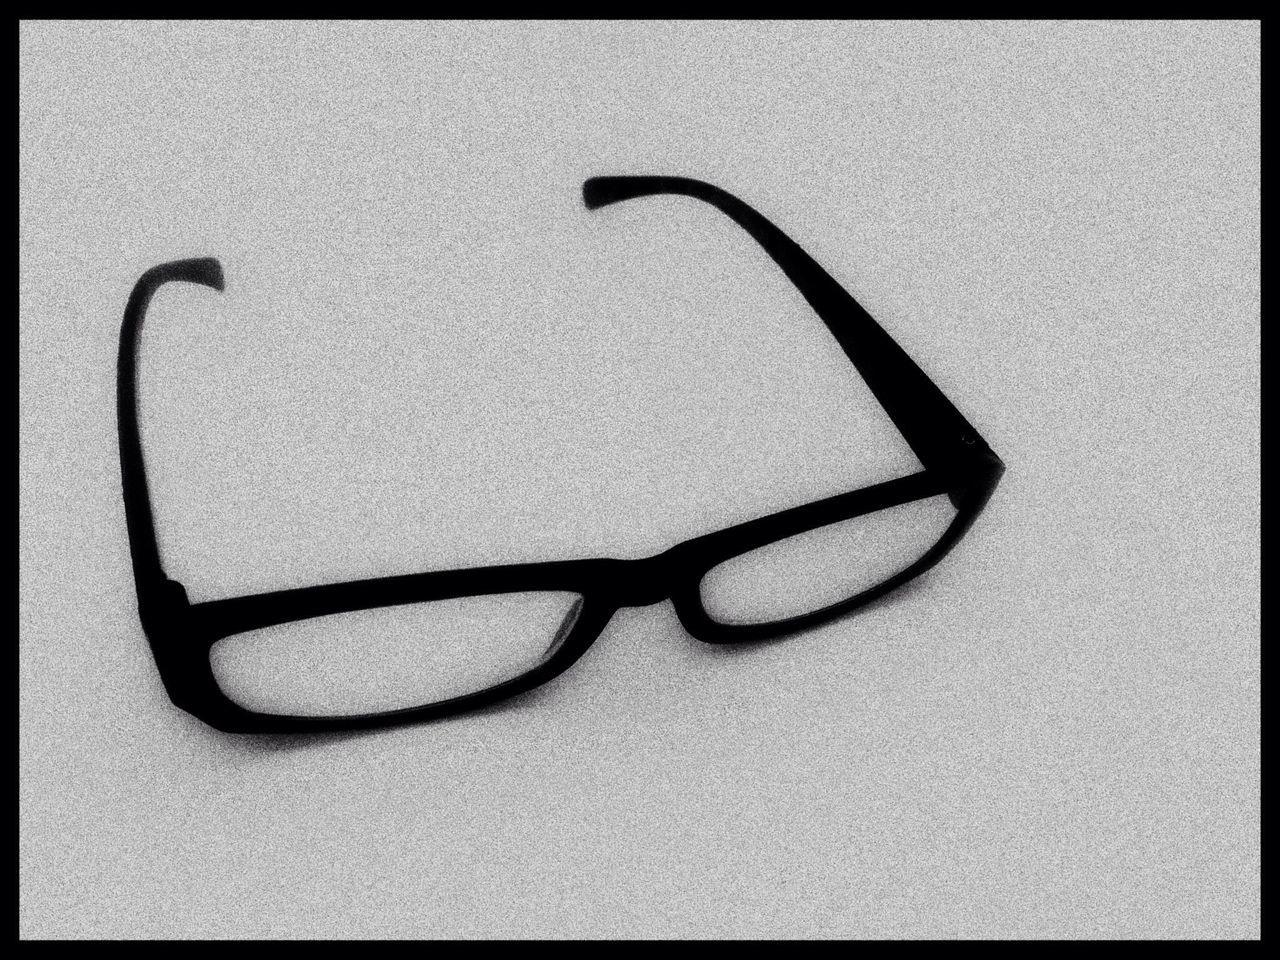 eyeglasses, no people, vision, close-up, glasses, eyesight, indoors, day